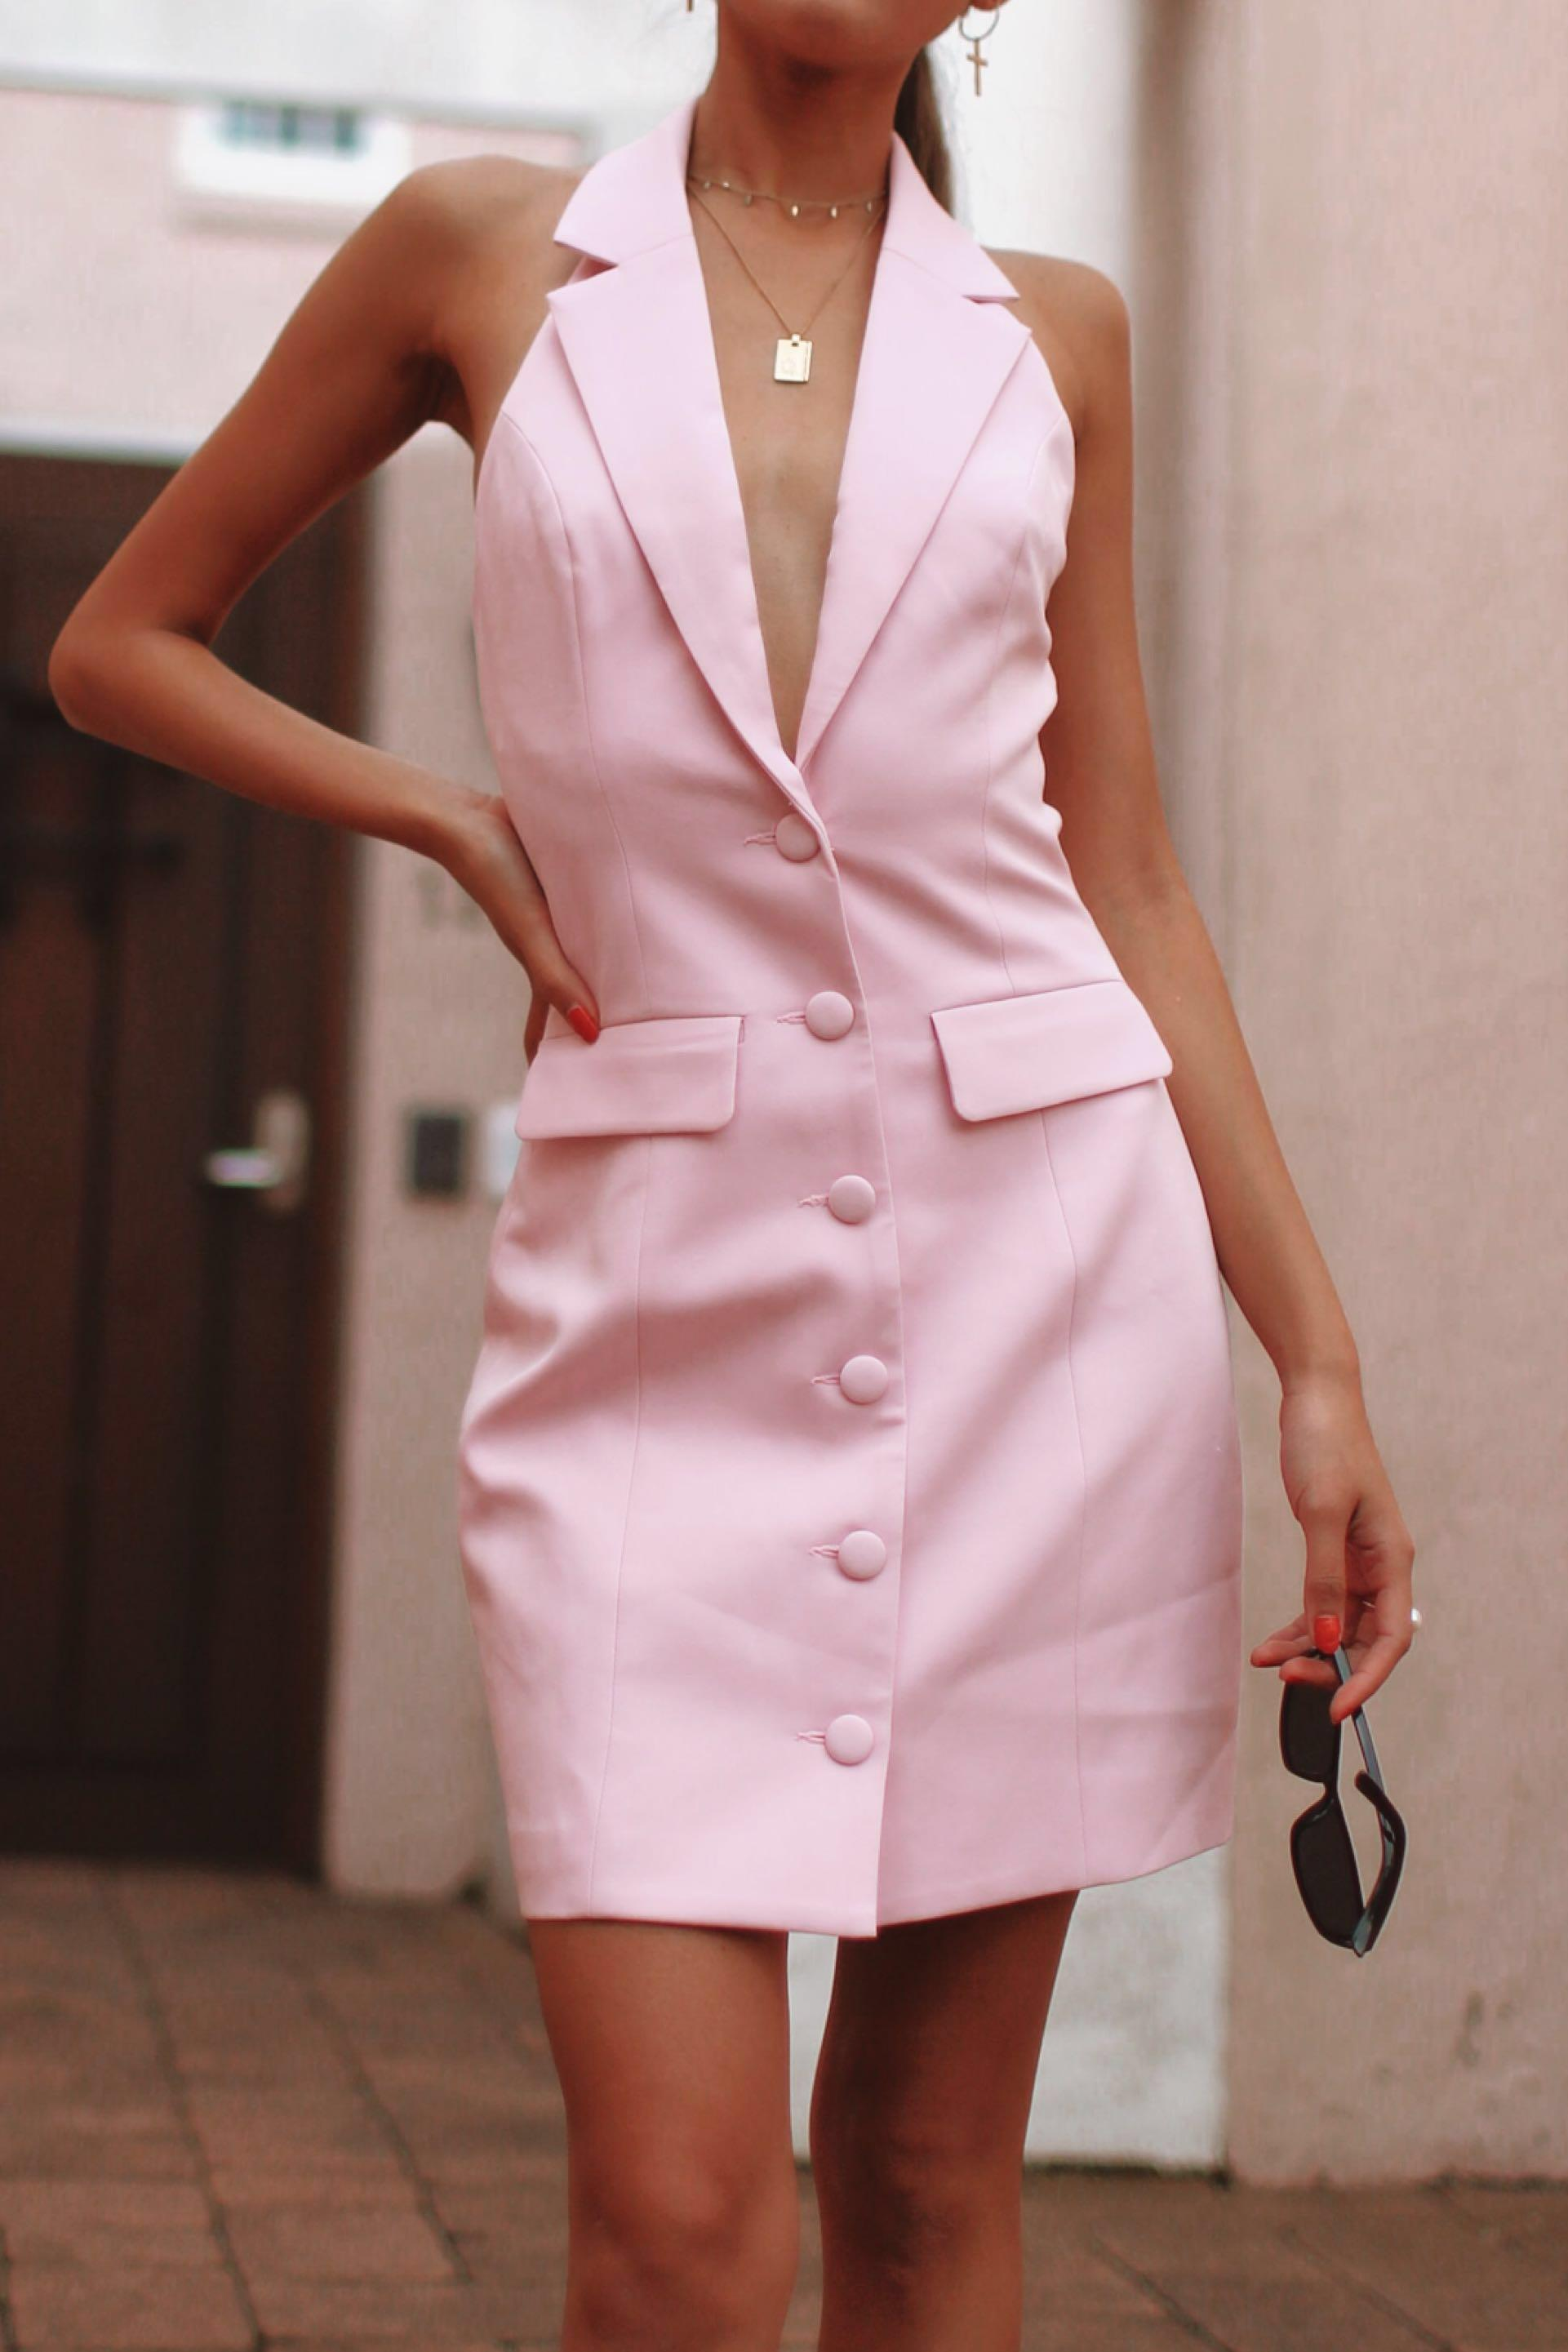 Meshki Daniella Collared Halter Dress - Light Pink